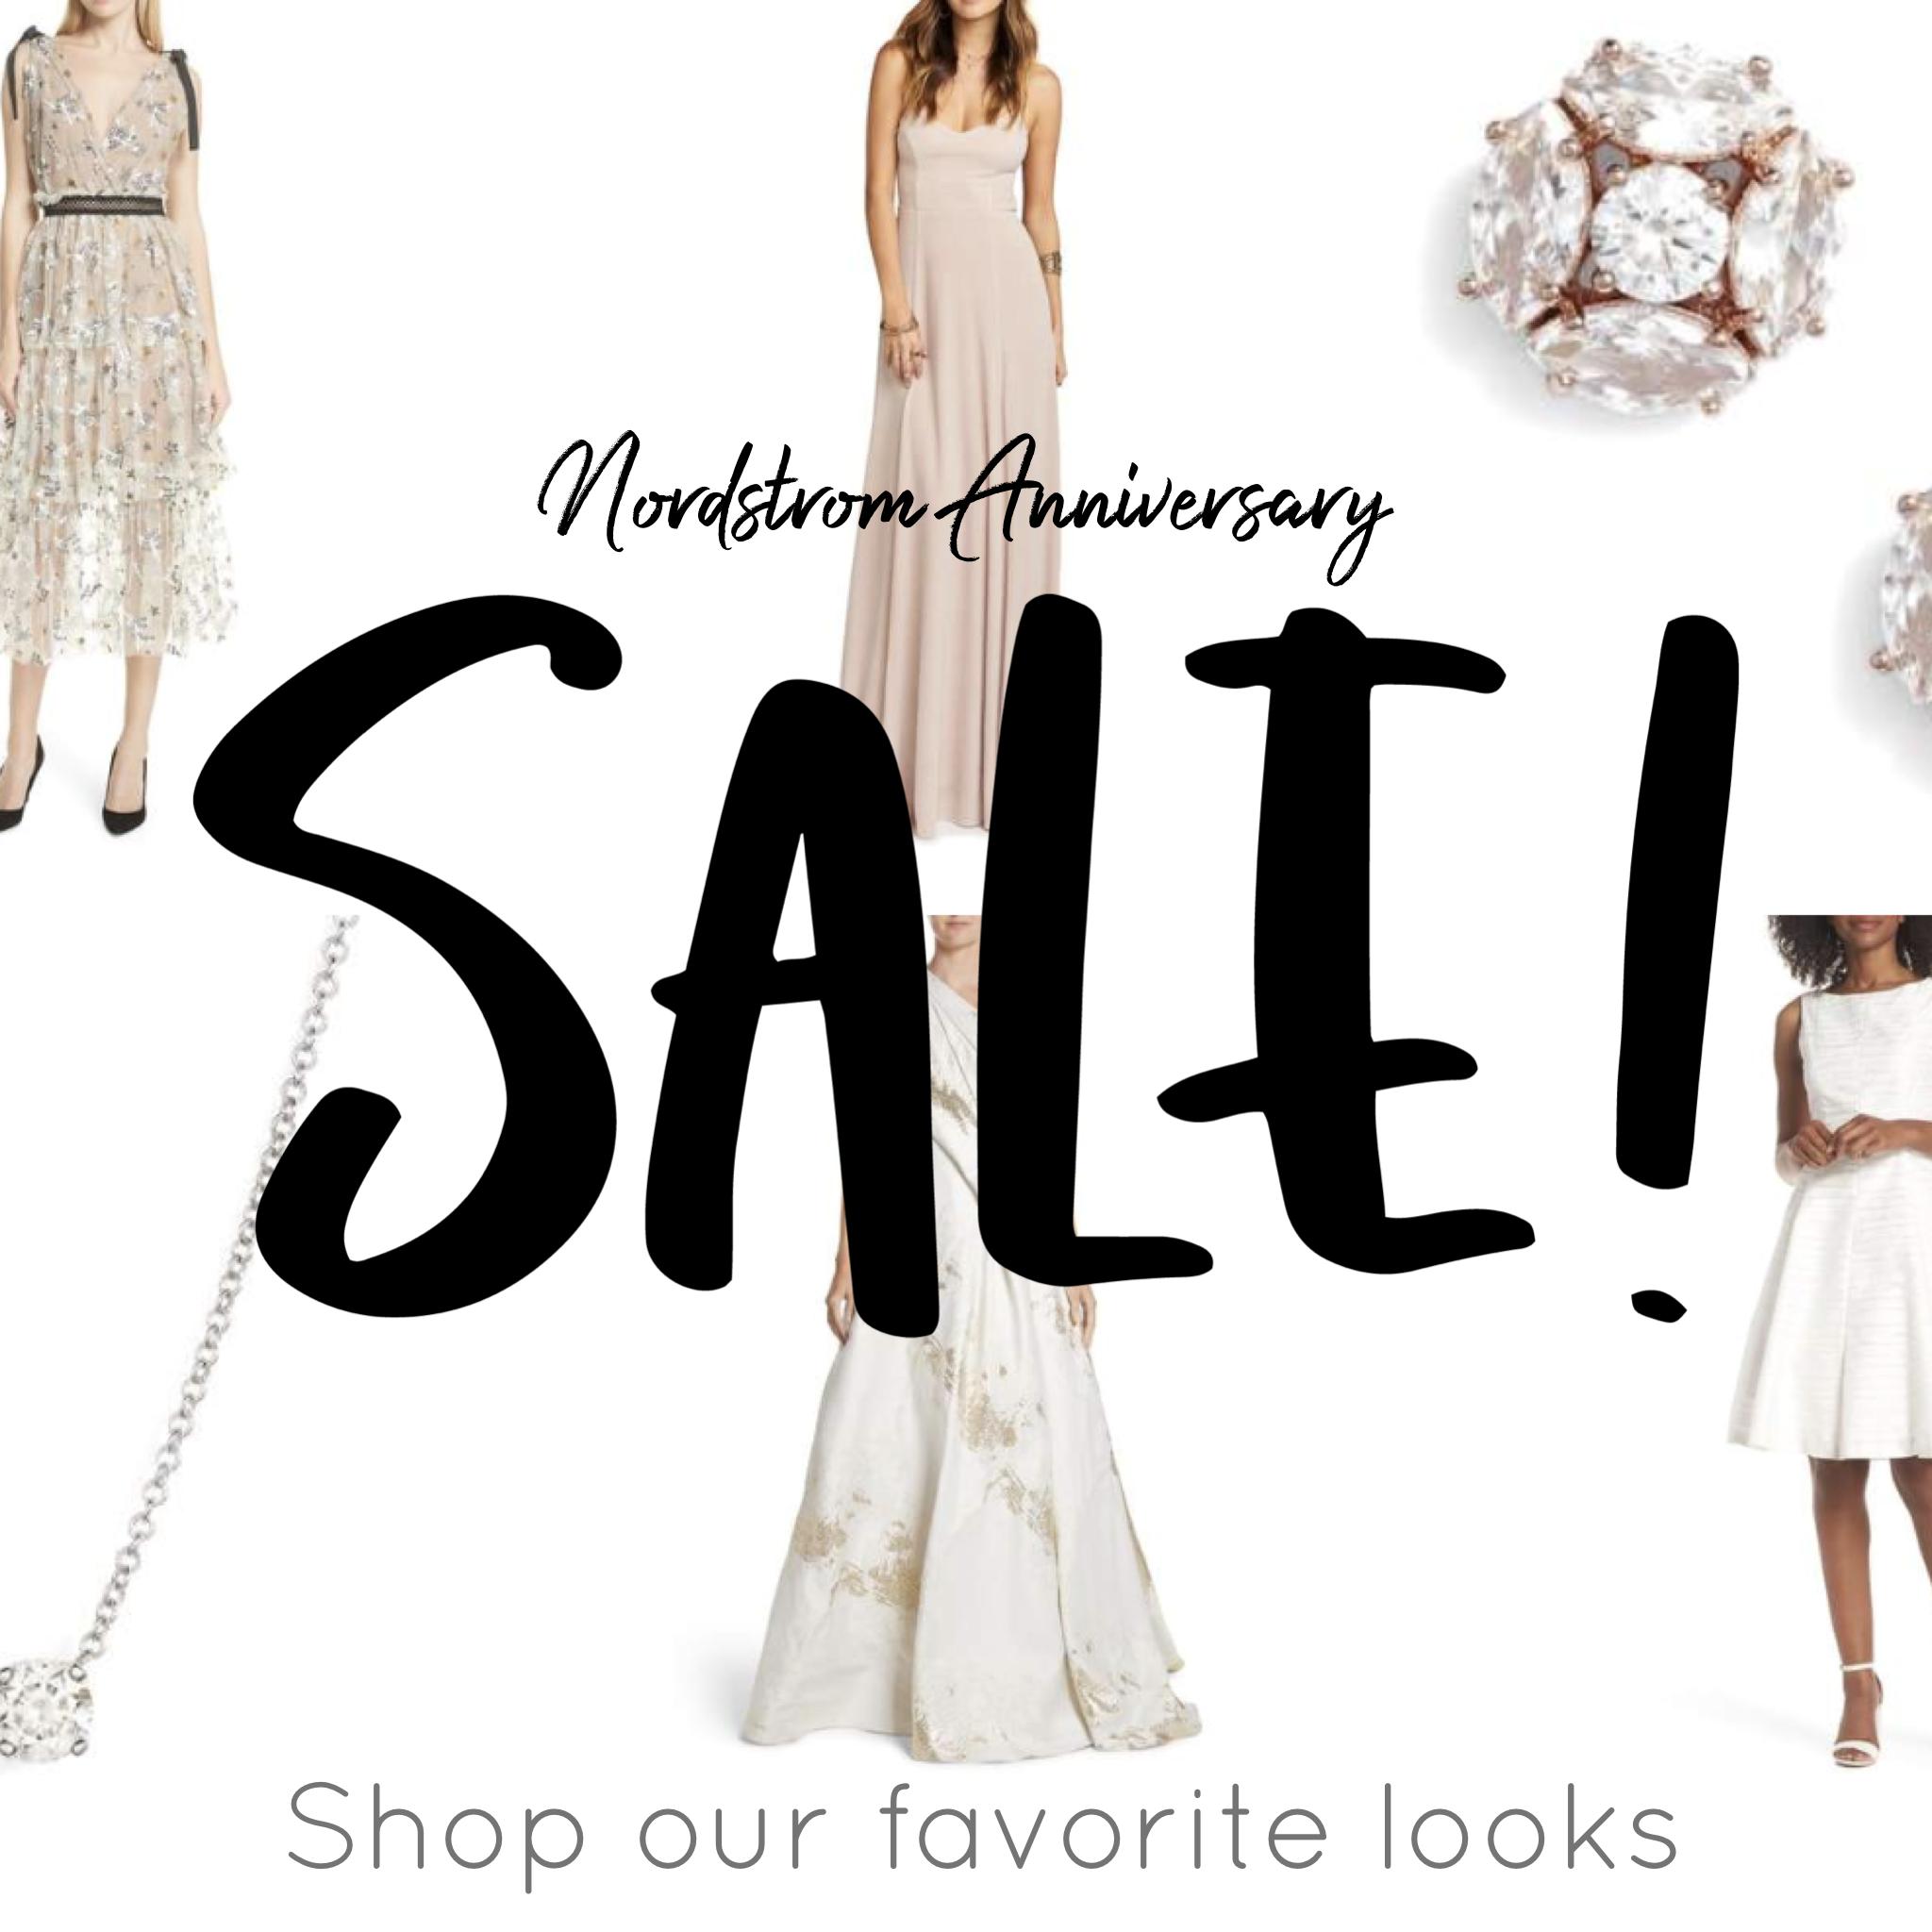 Mother of the bride wedding dresses nordstrom  The Best Wedding Deals from the Nordstrom Anniversary Sale